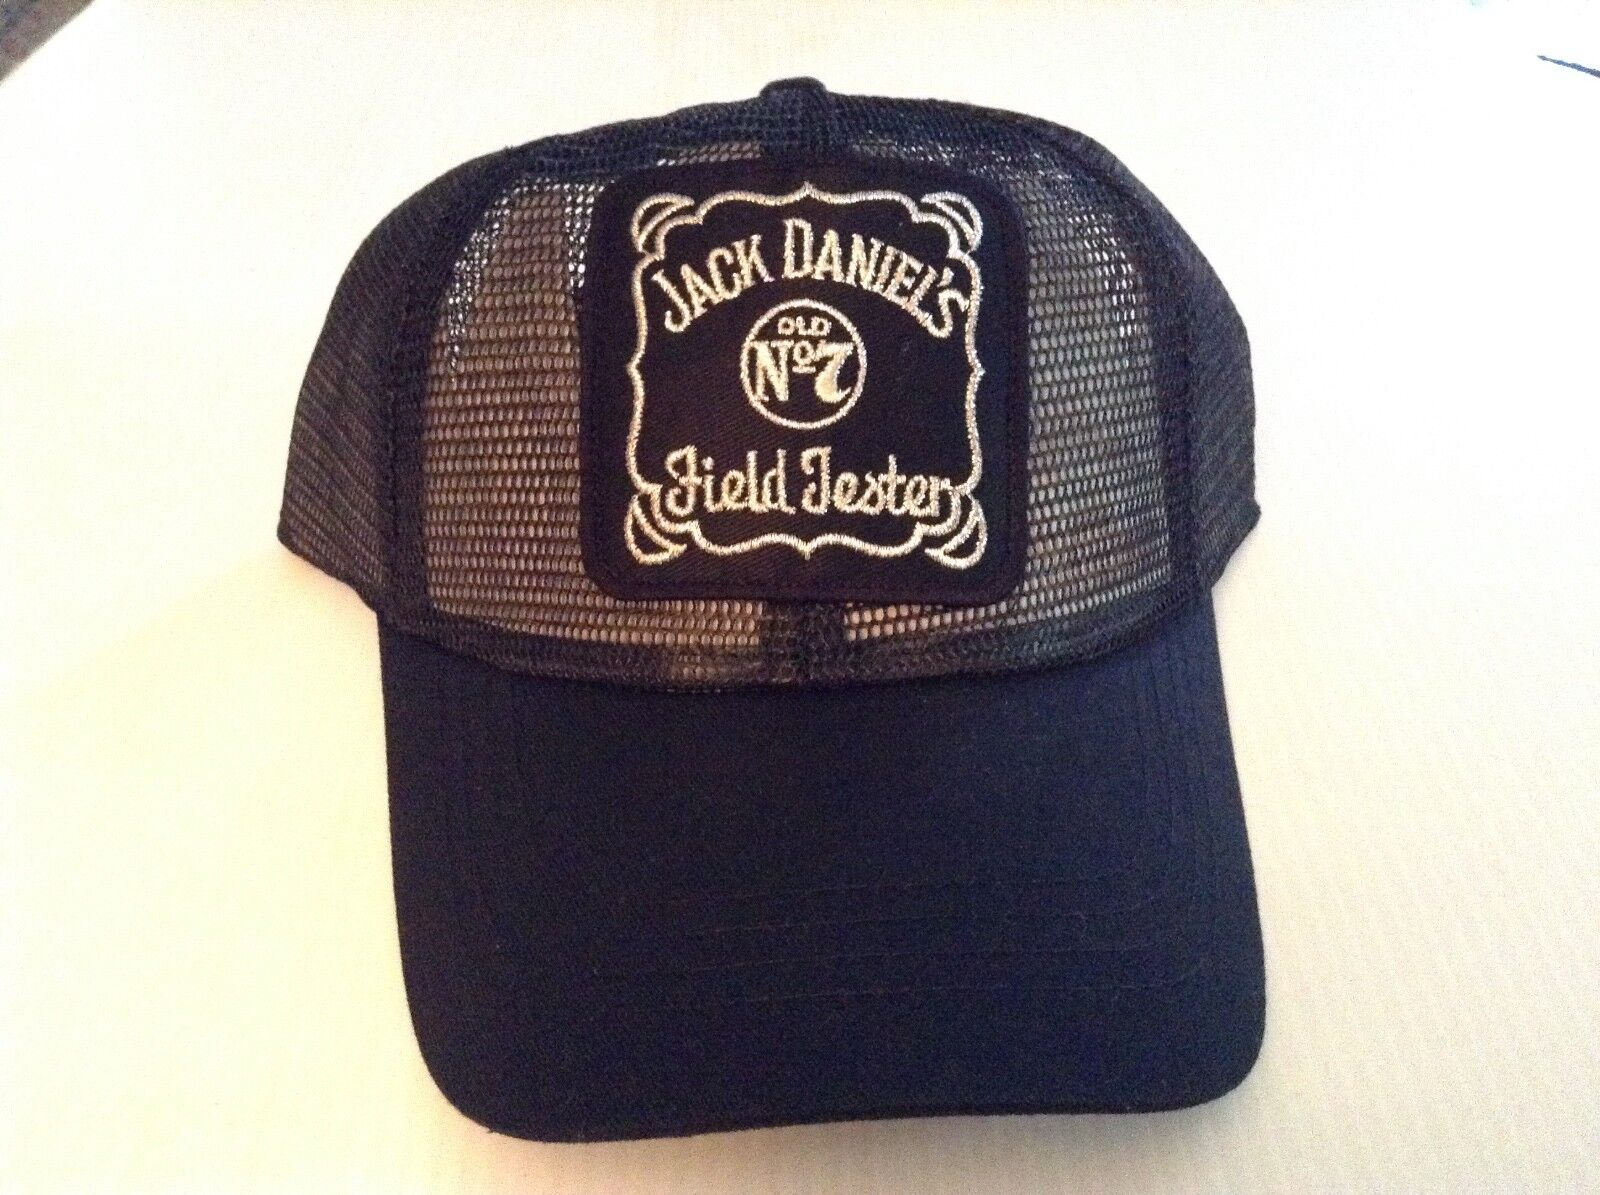 VTG New Jack Jack Jack Daniels Field Tester Patch Mesh Snapback Trucker Hat - Cool dda9a1